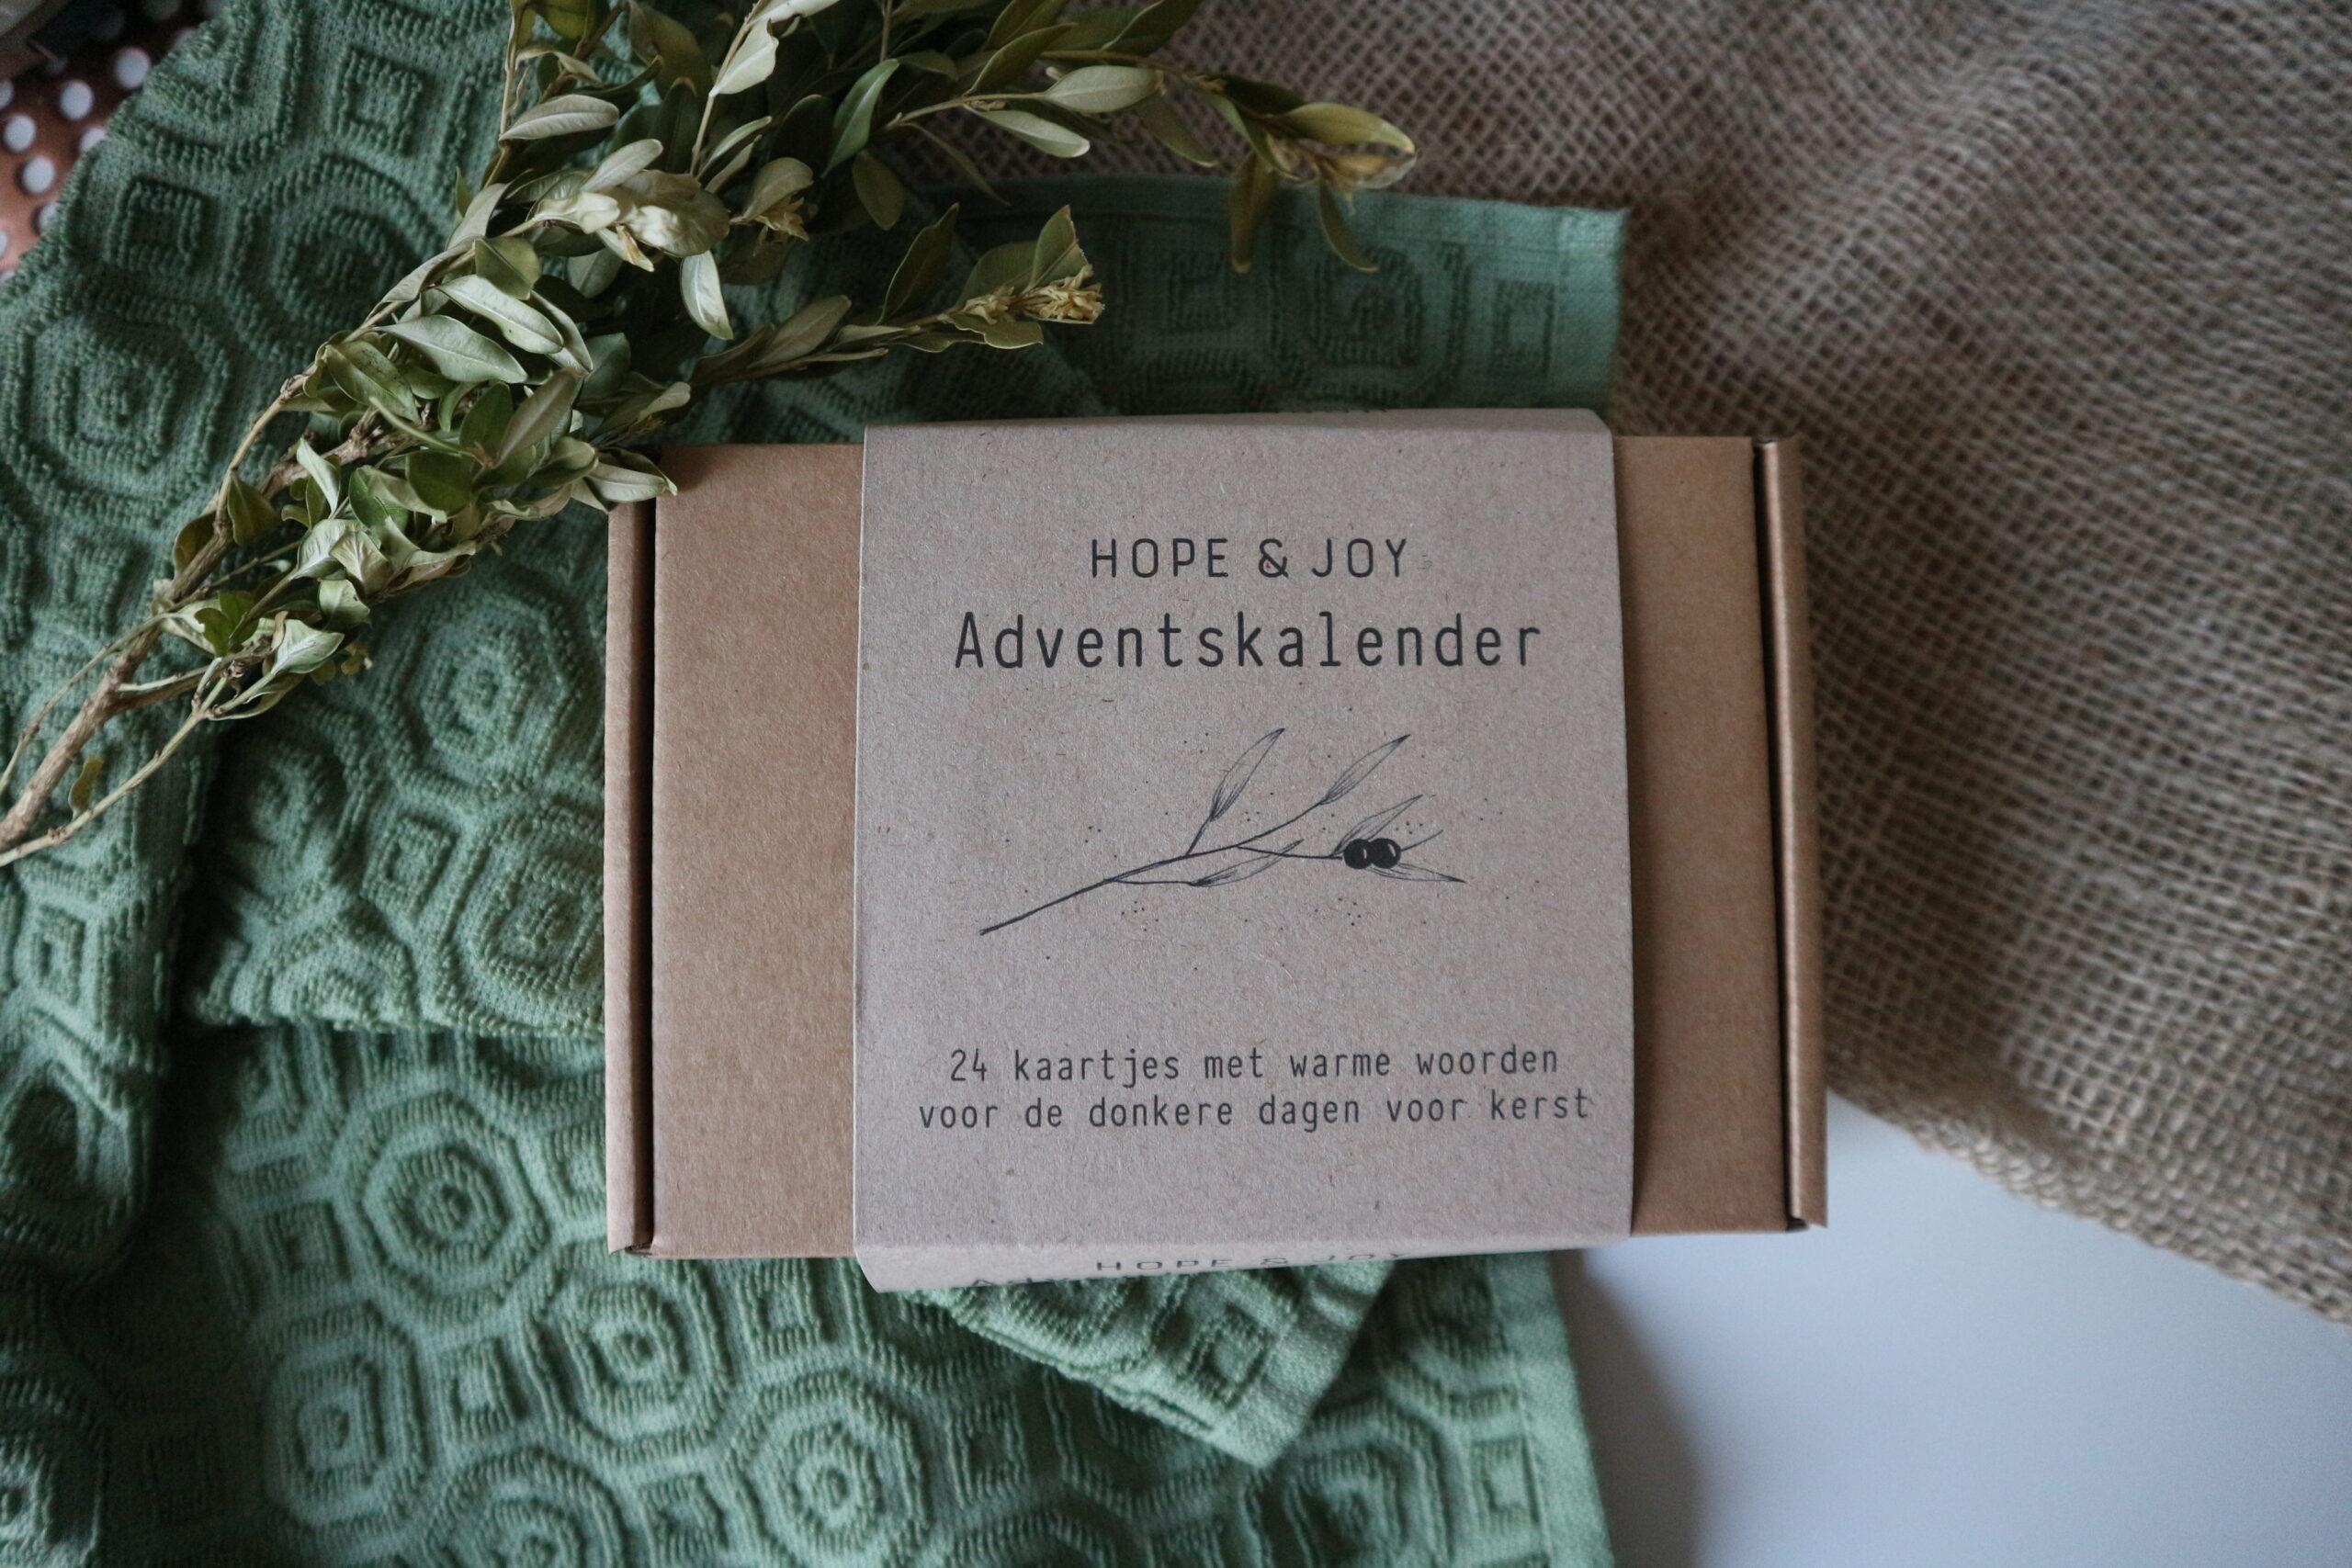 Minimalistische advenstkalender van Hope & Joy